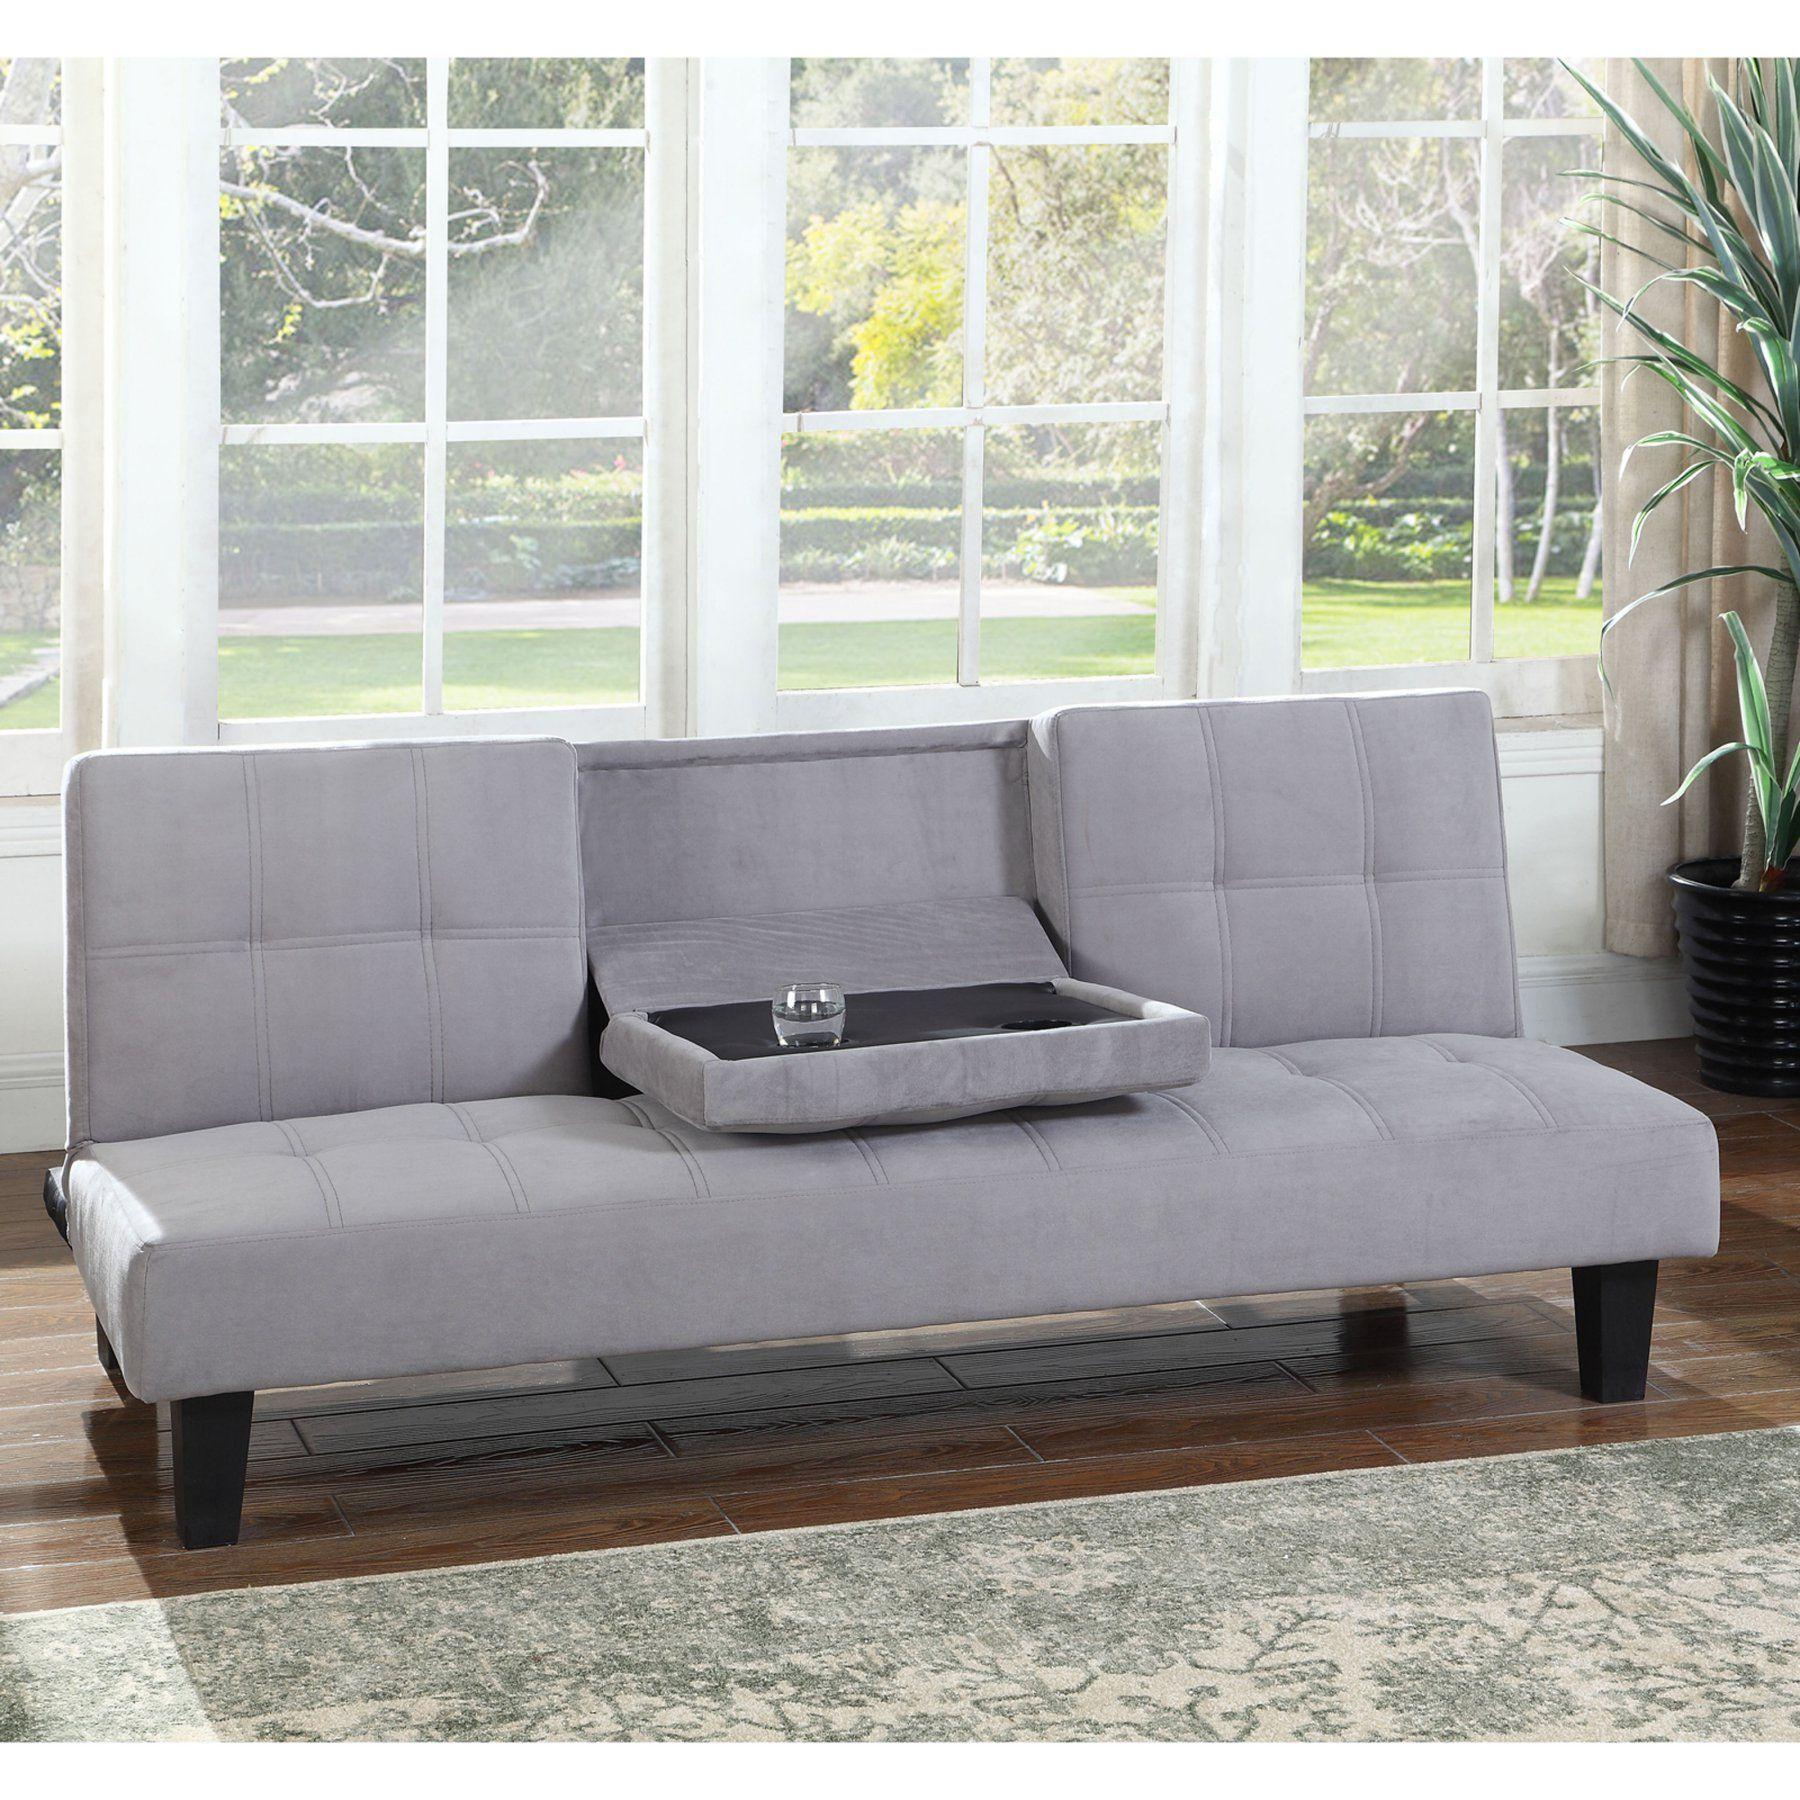 Furniture Emili Tufted Grey Suede